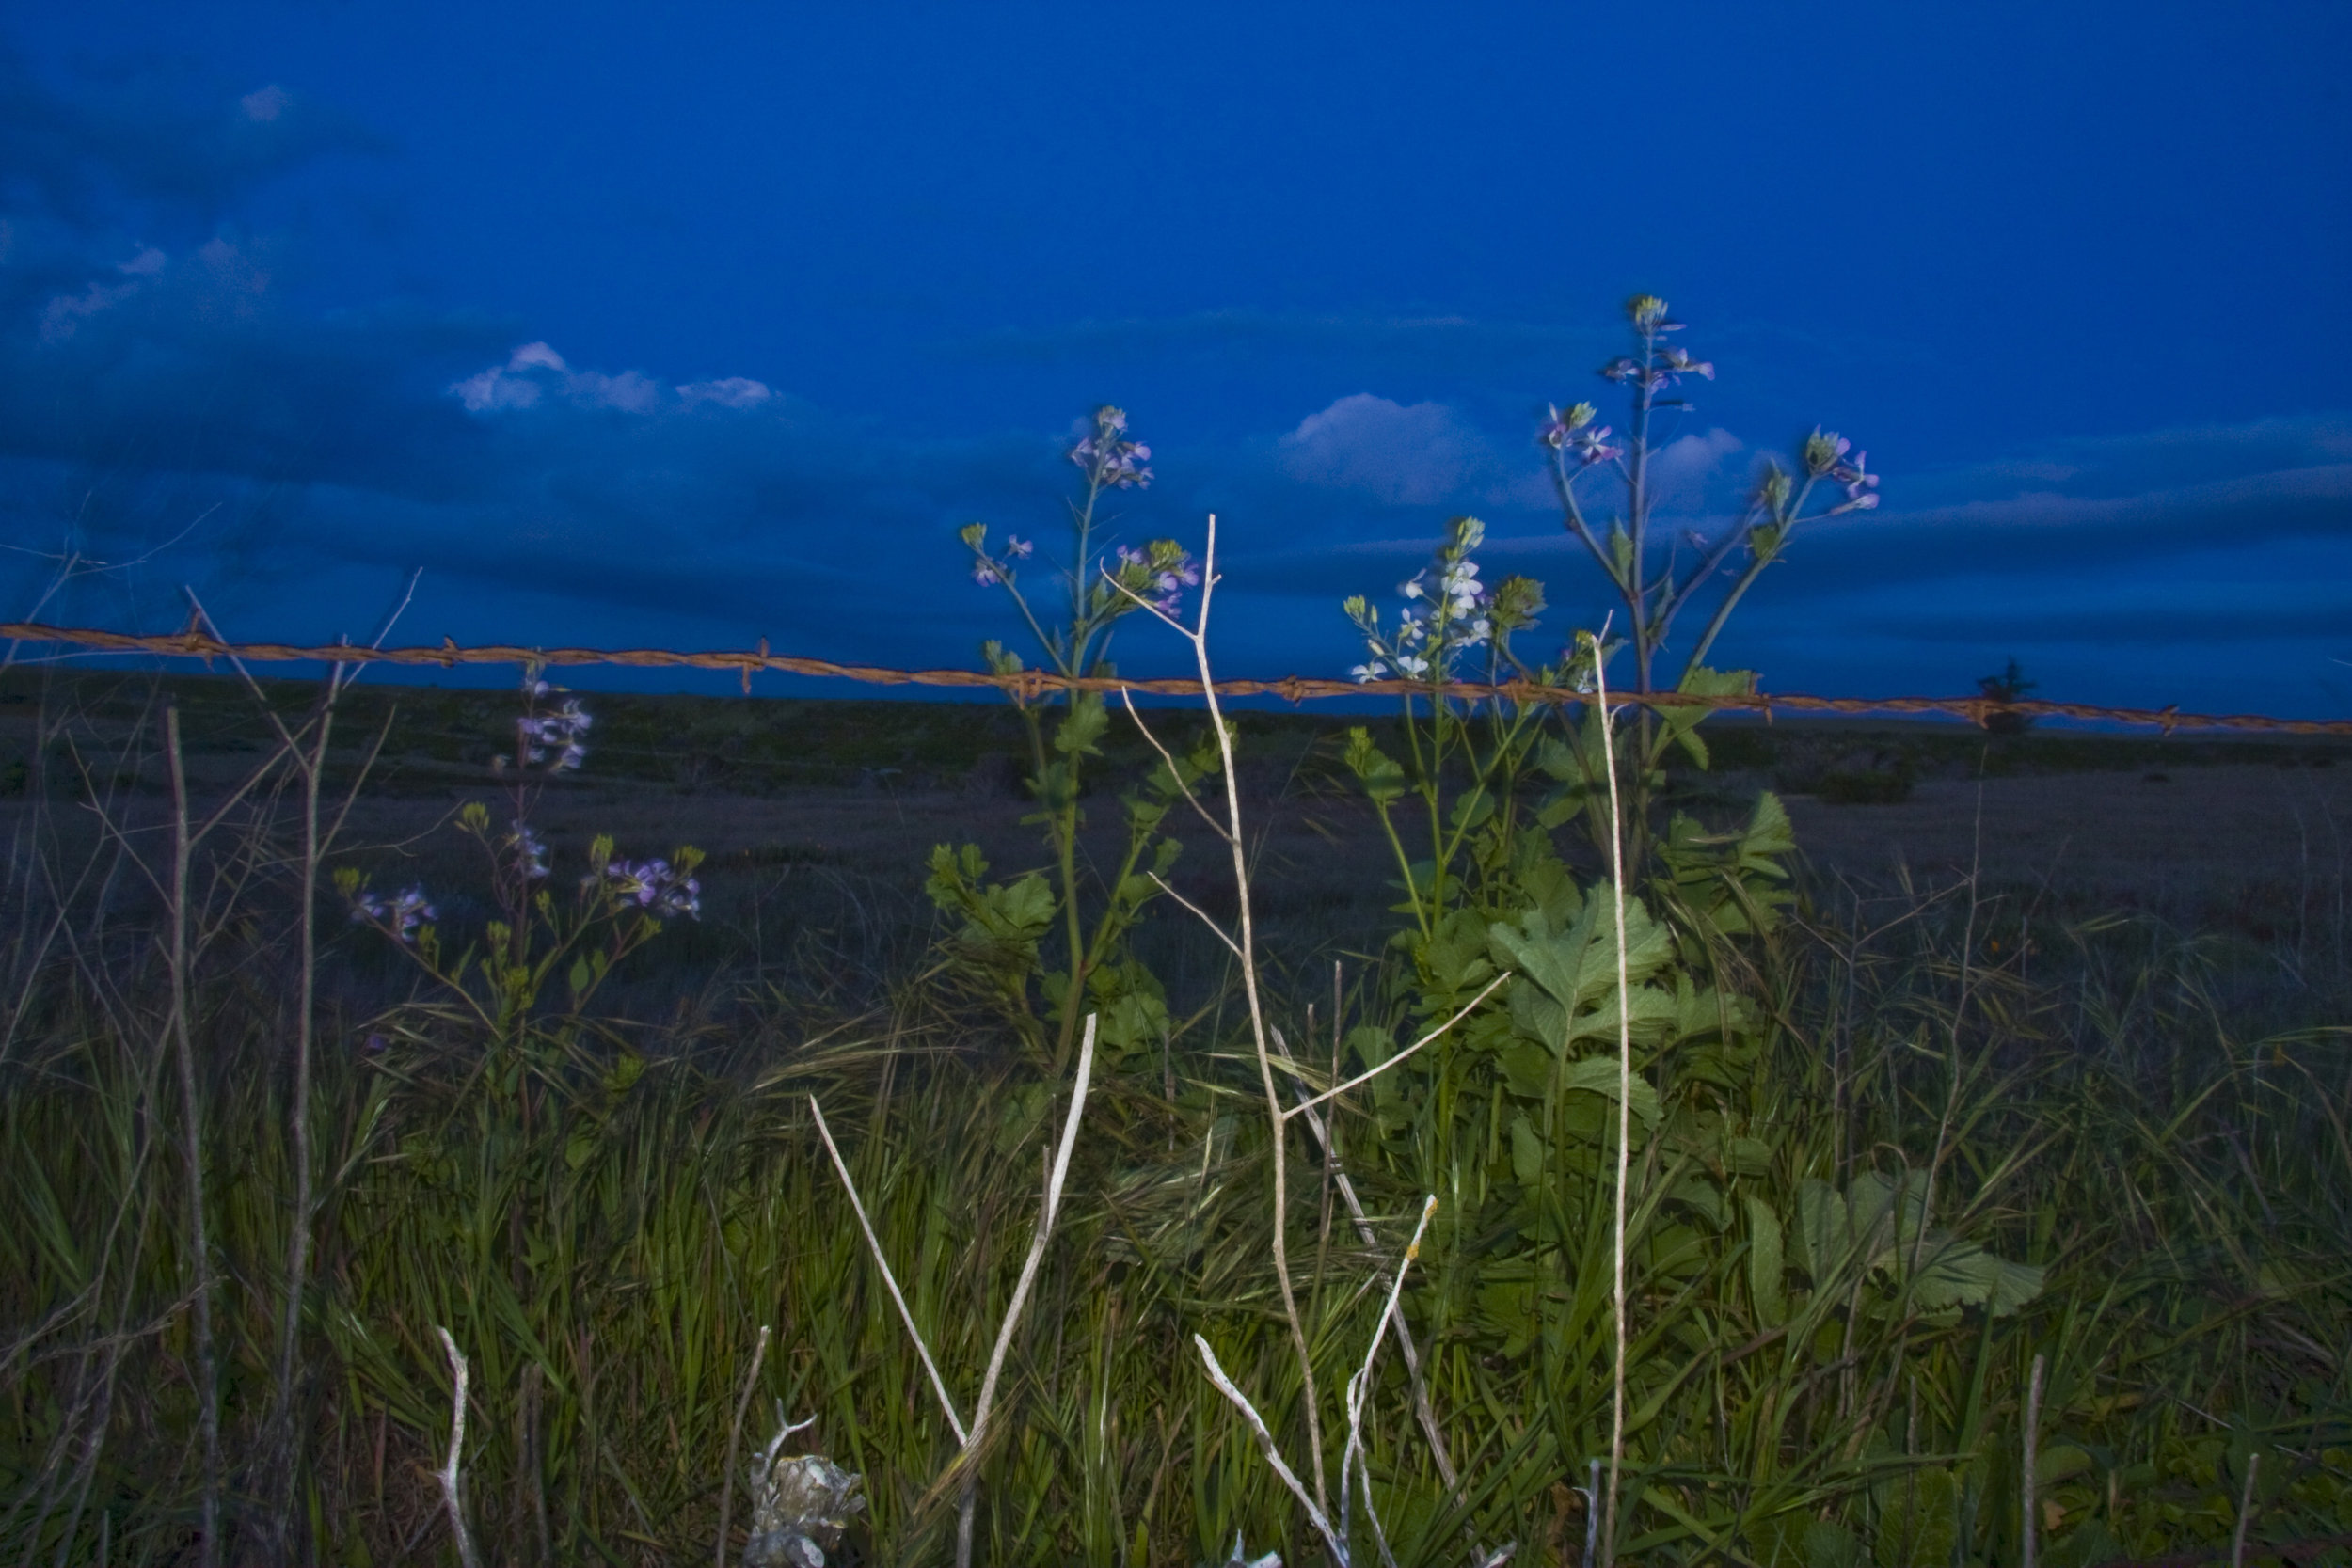 Lapis Road Nightfall